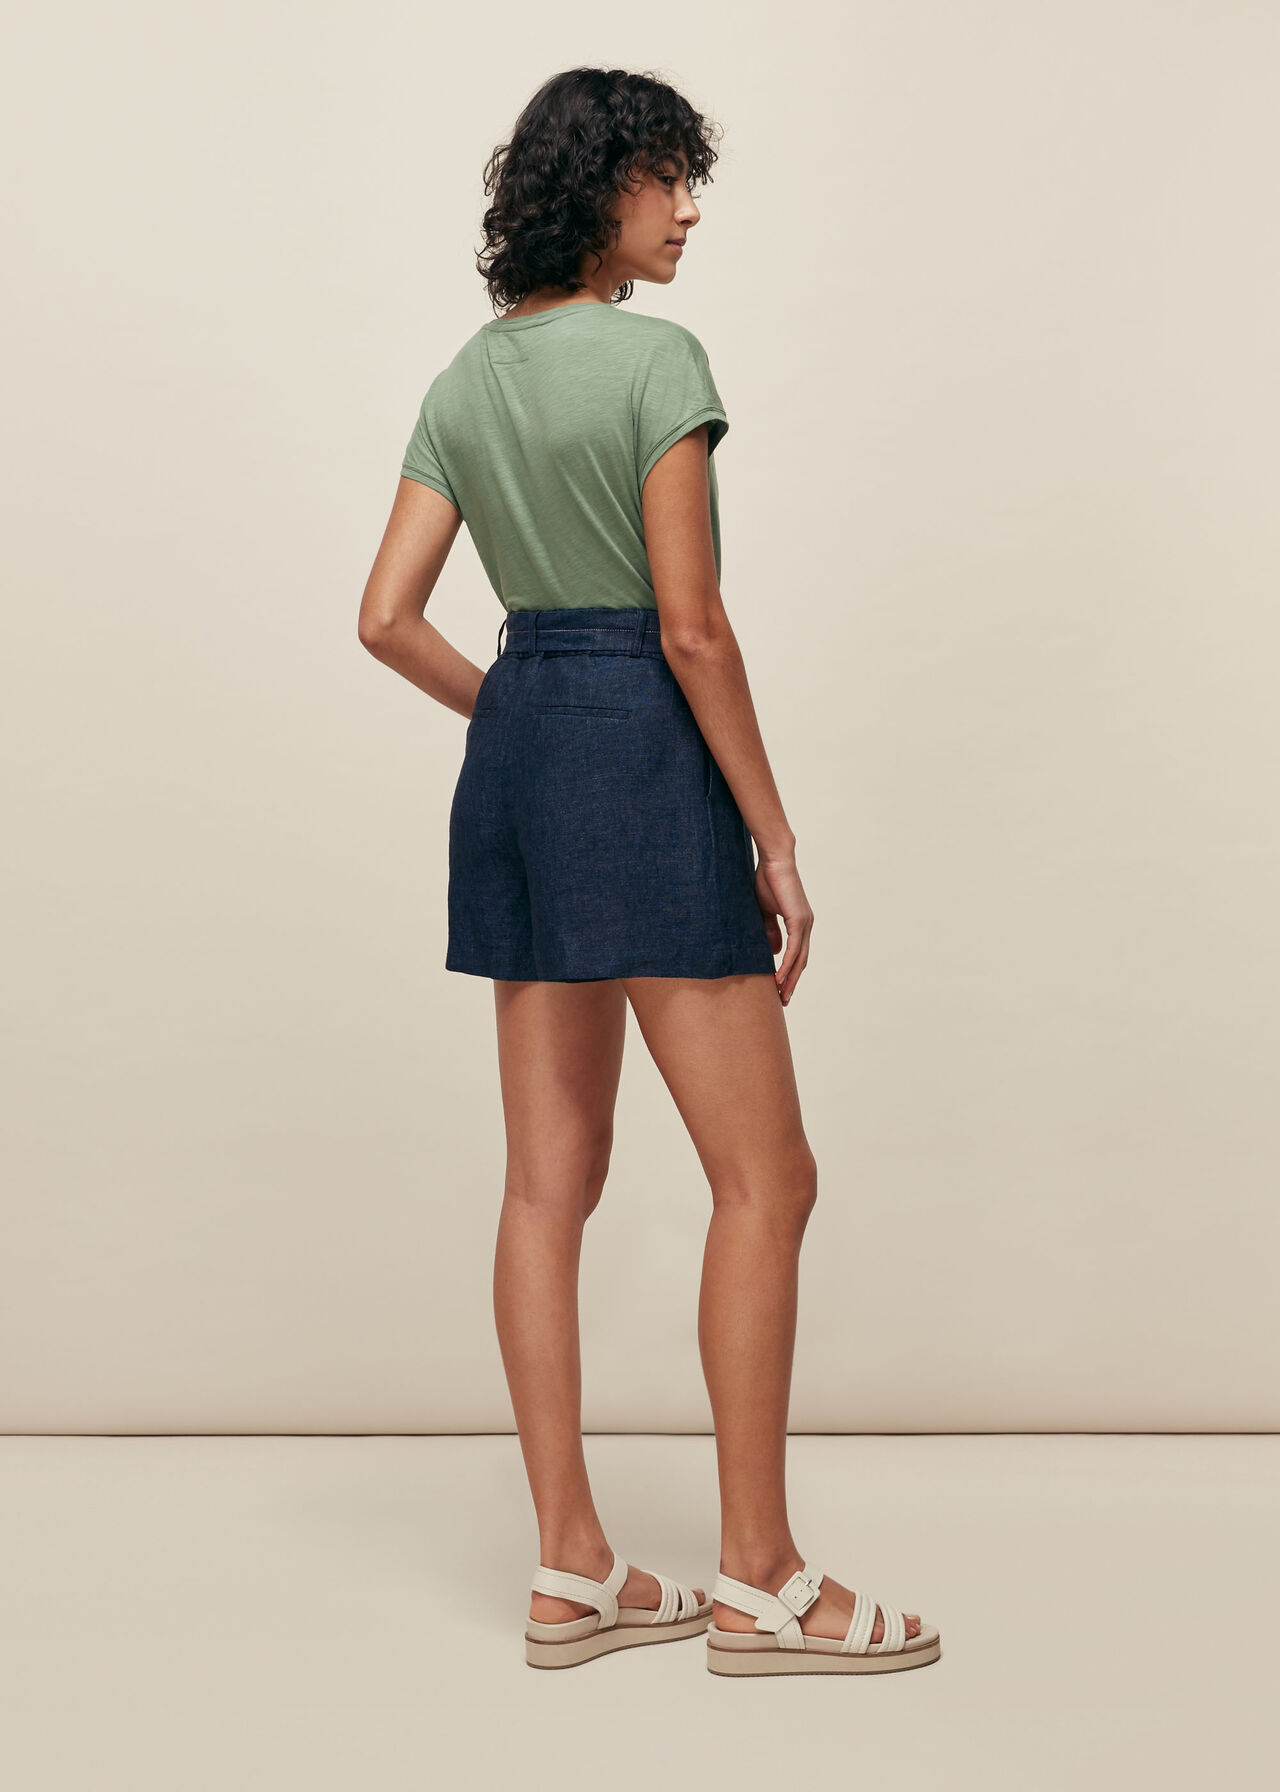 Indigo Linen Short